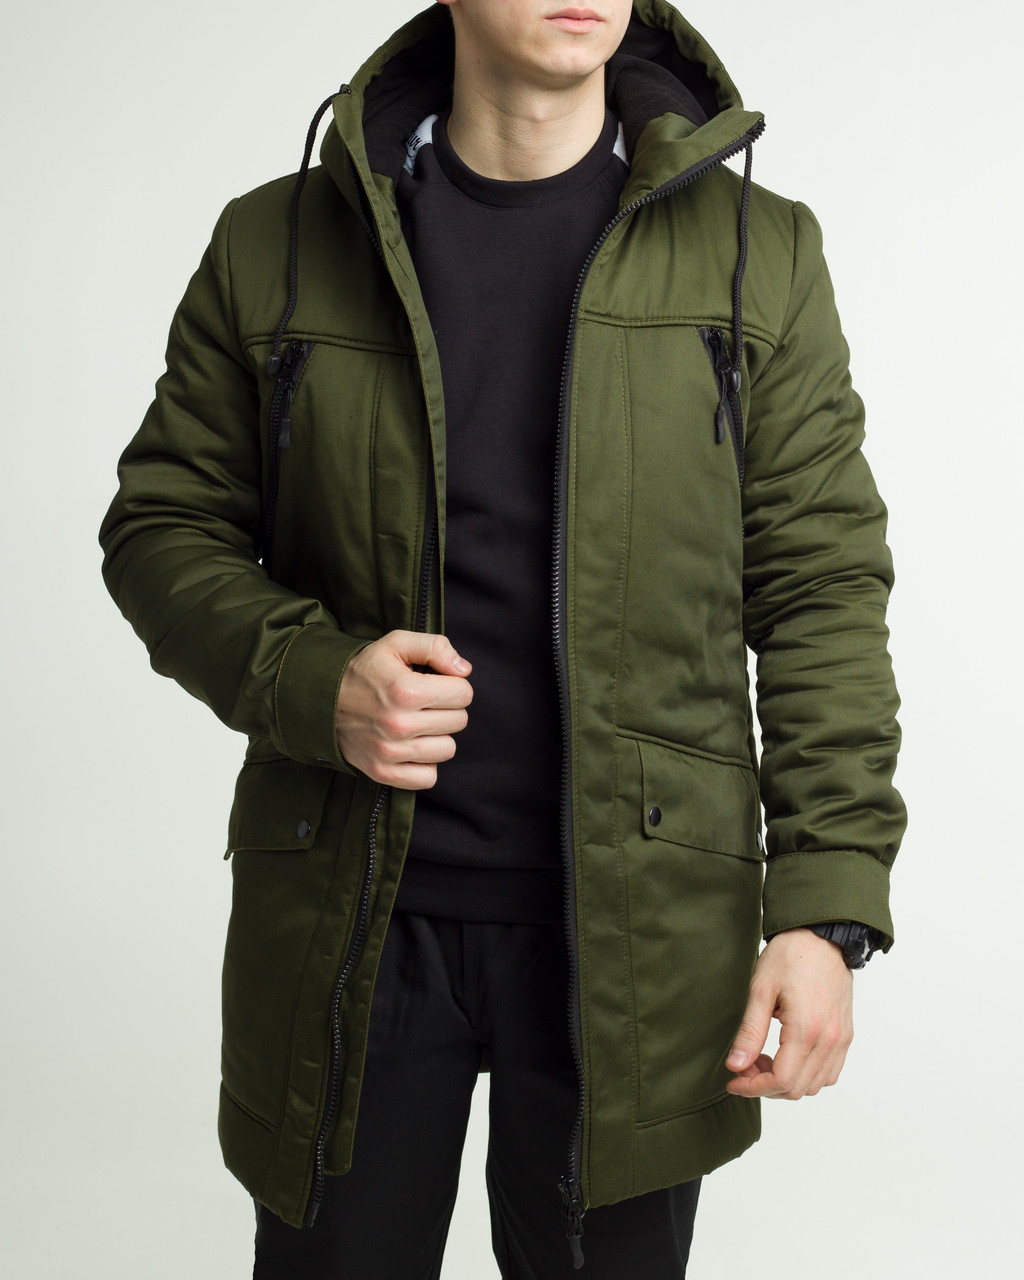 3a06e12e6cc8 Зимняя мужская куртка ТУР Grizli хаки